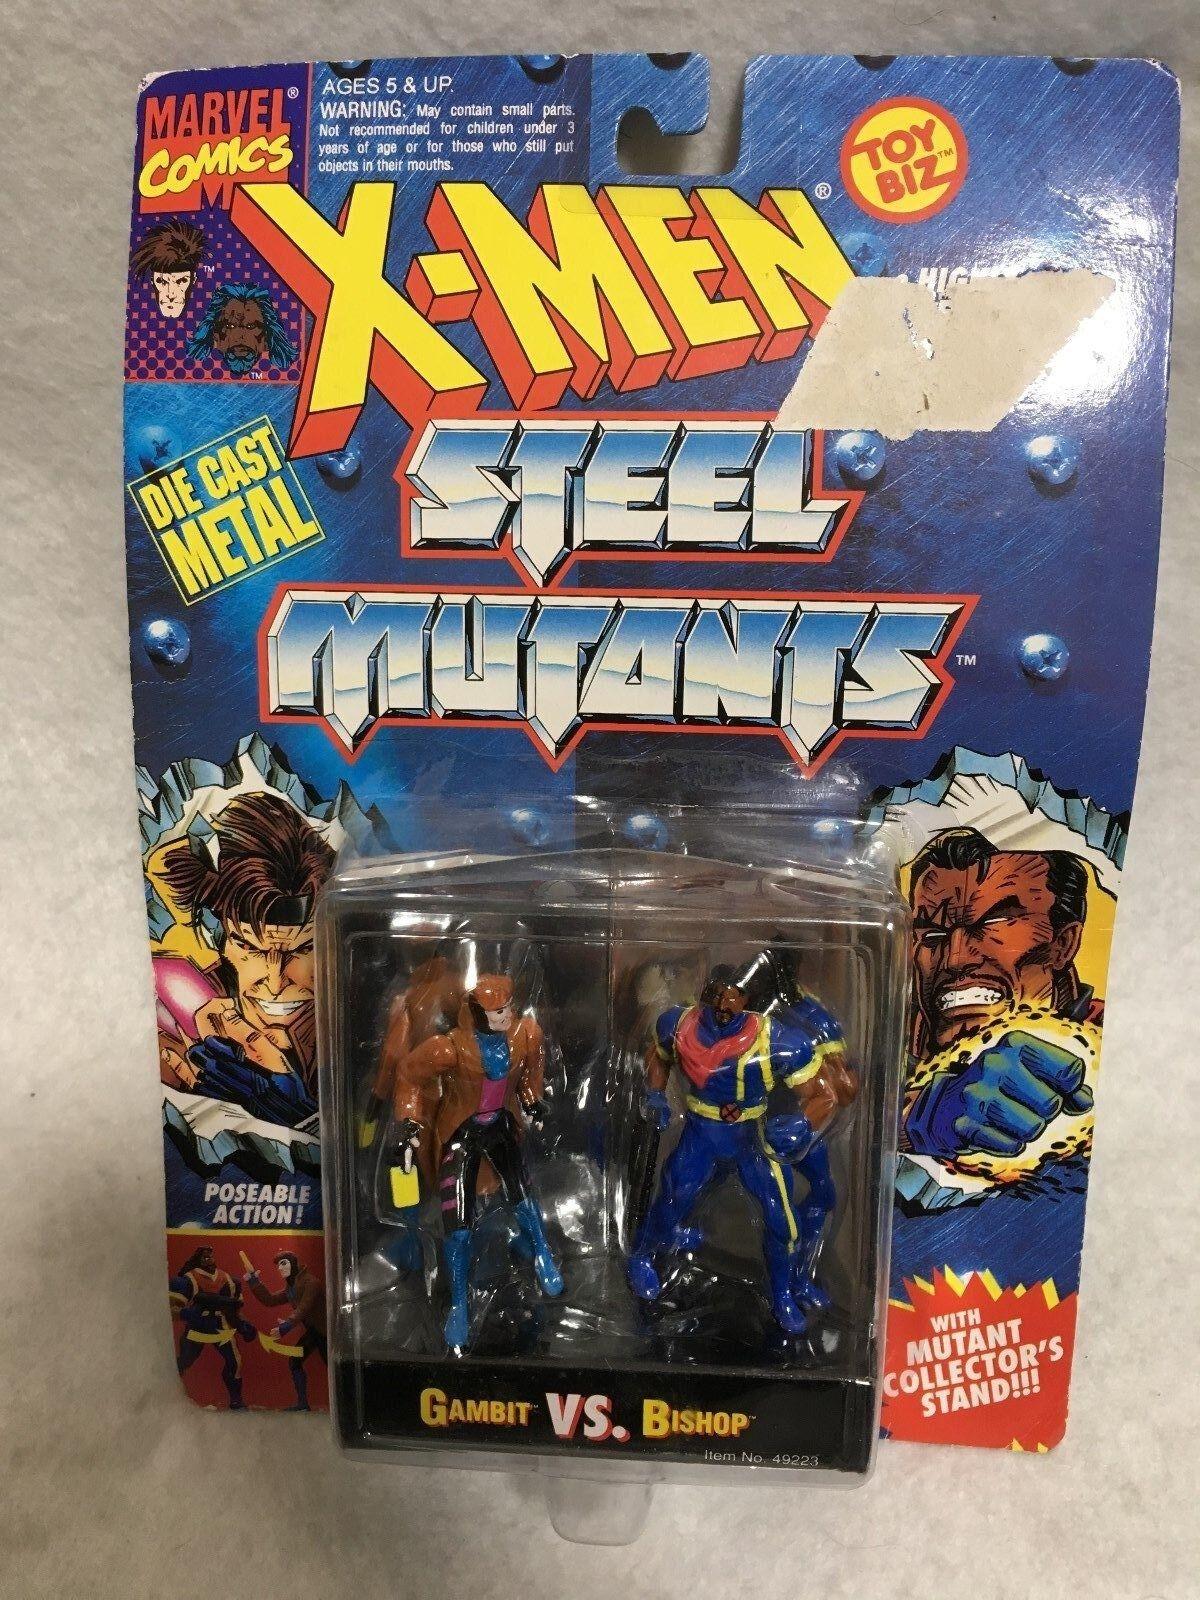 ToyBiz Die Cast Metal X-Men Steel Mutants Gambit VS Bishop Japan